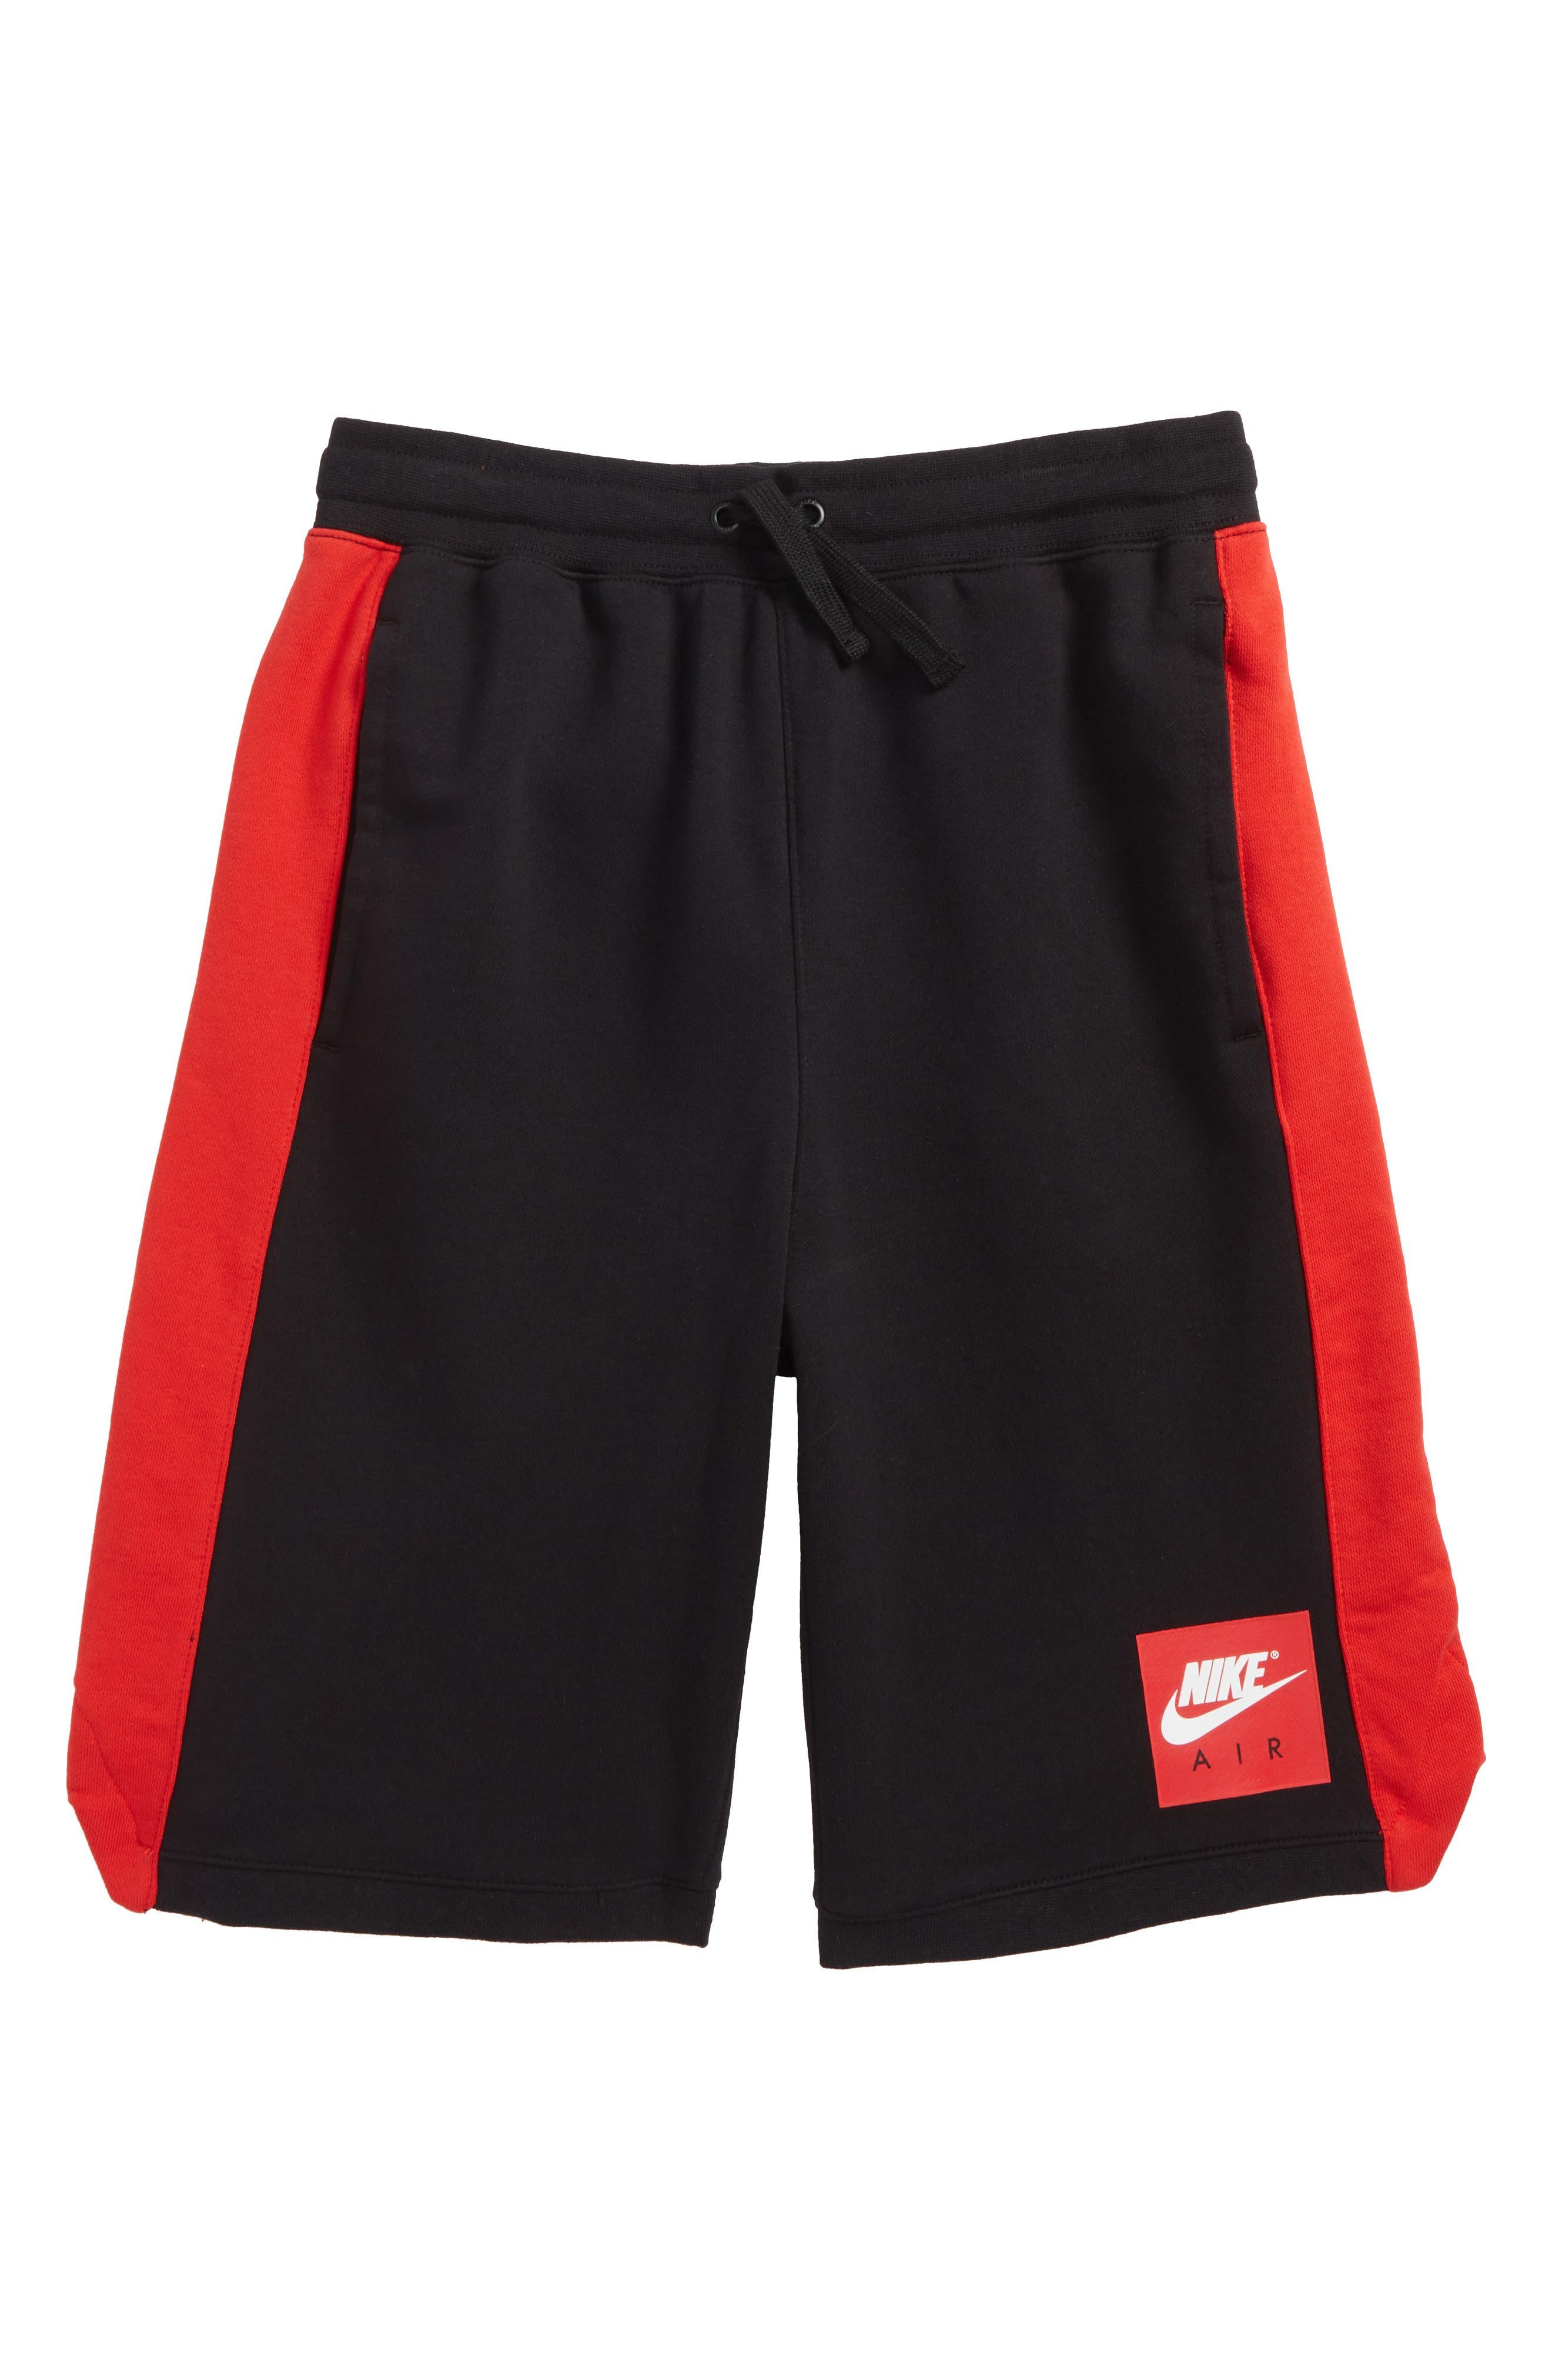 Air Shorts,                         Main,                         color, Black/ University Red